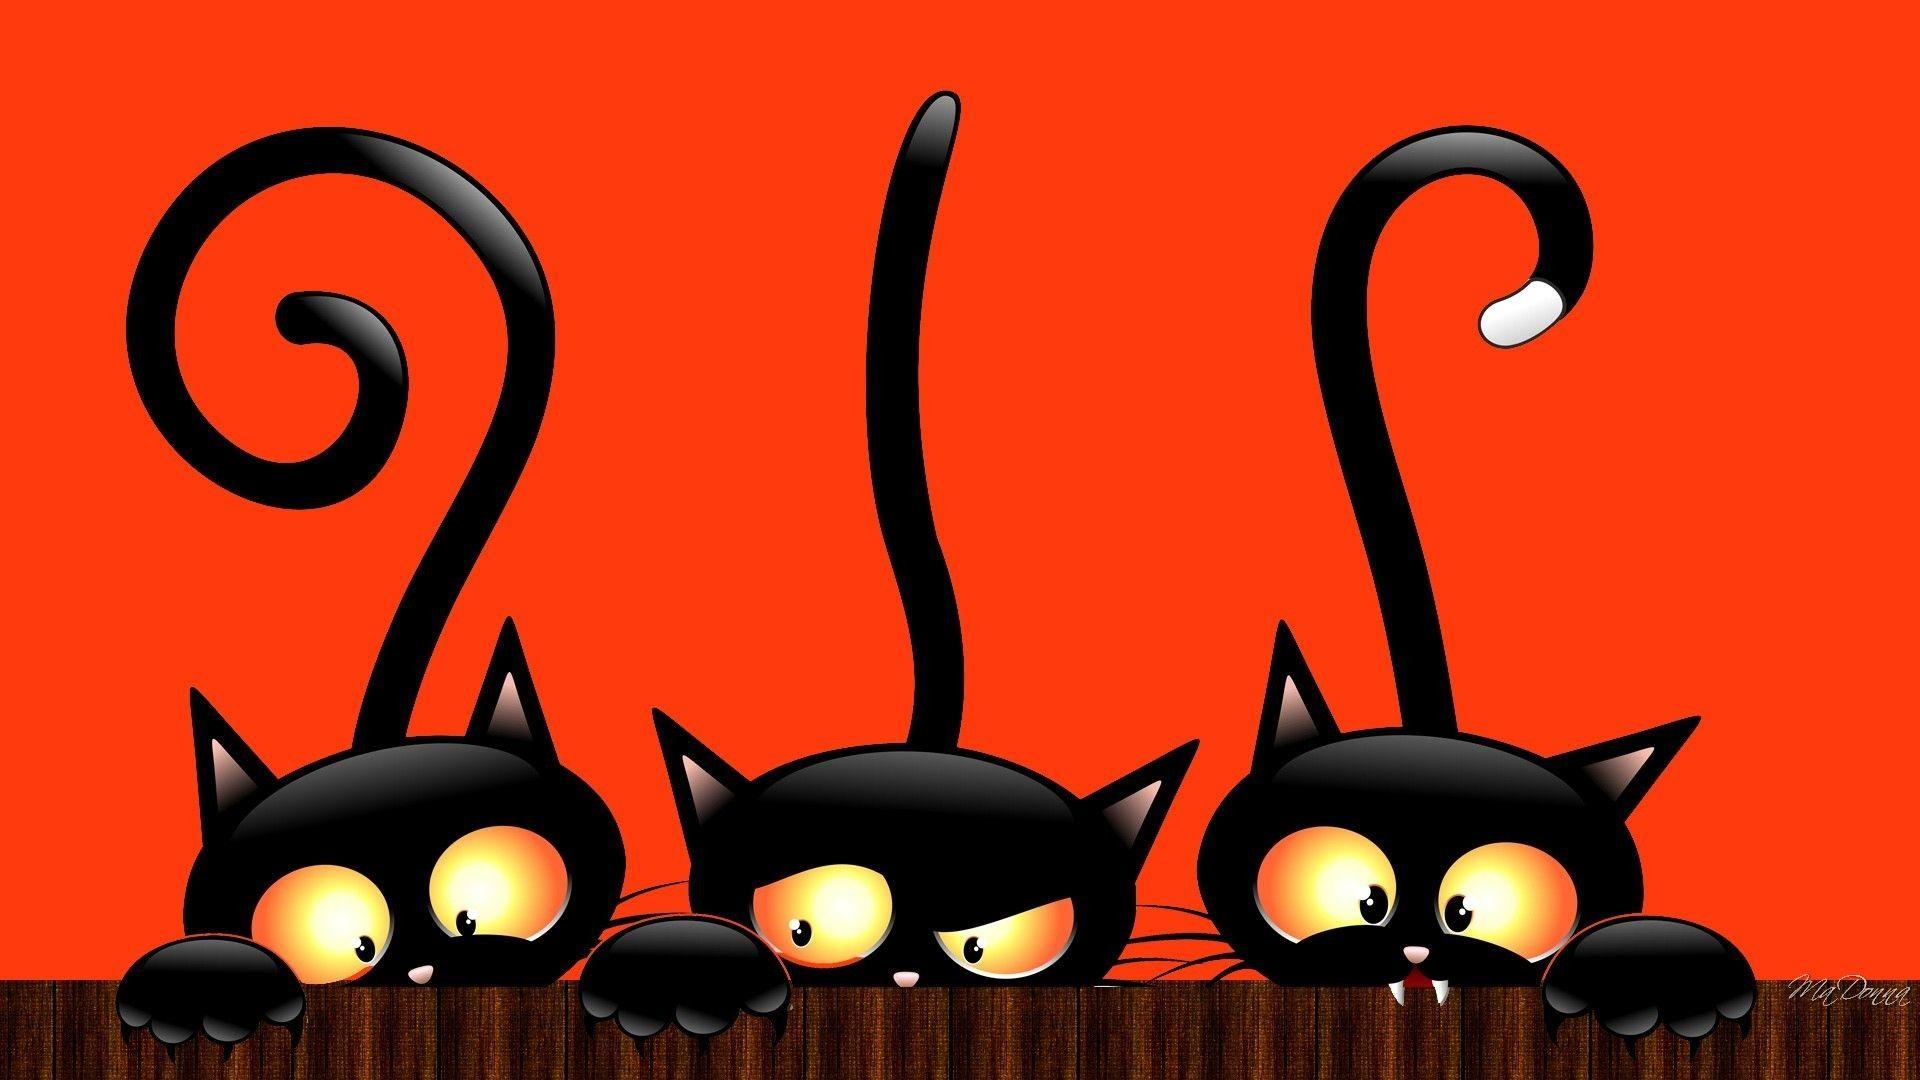 Image Result For Computer Wallpaper Cat Wallpaper Halloween Cat Whimsical Halloween